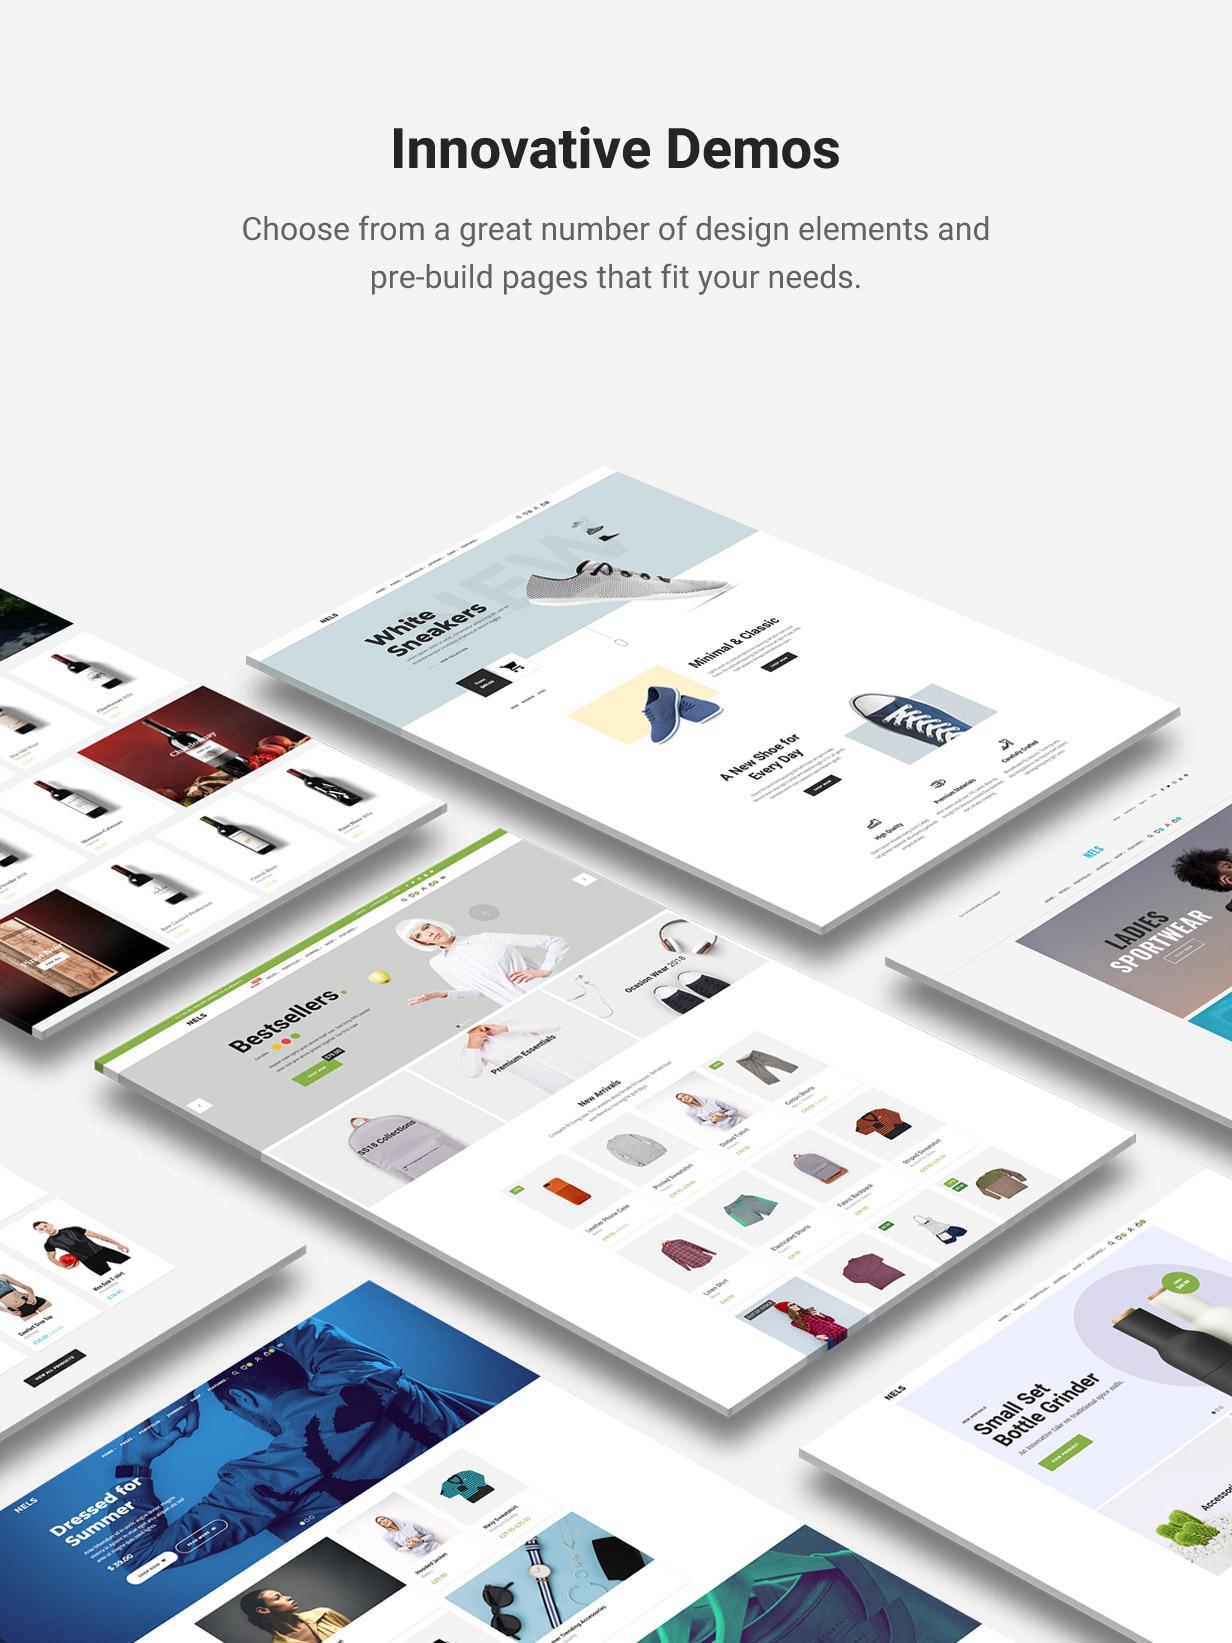 Nels - Ein exquisites eCommerce WordPress Template - 2